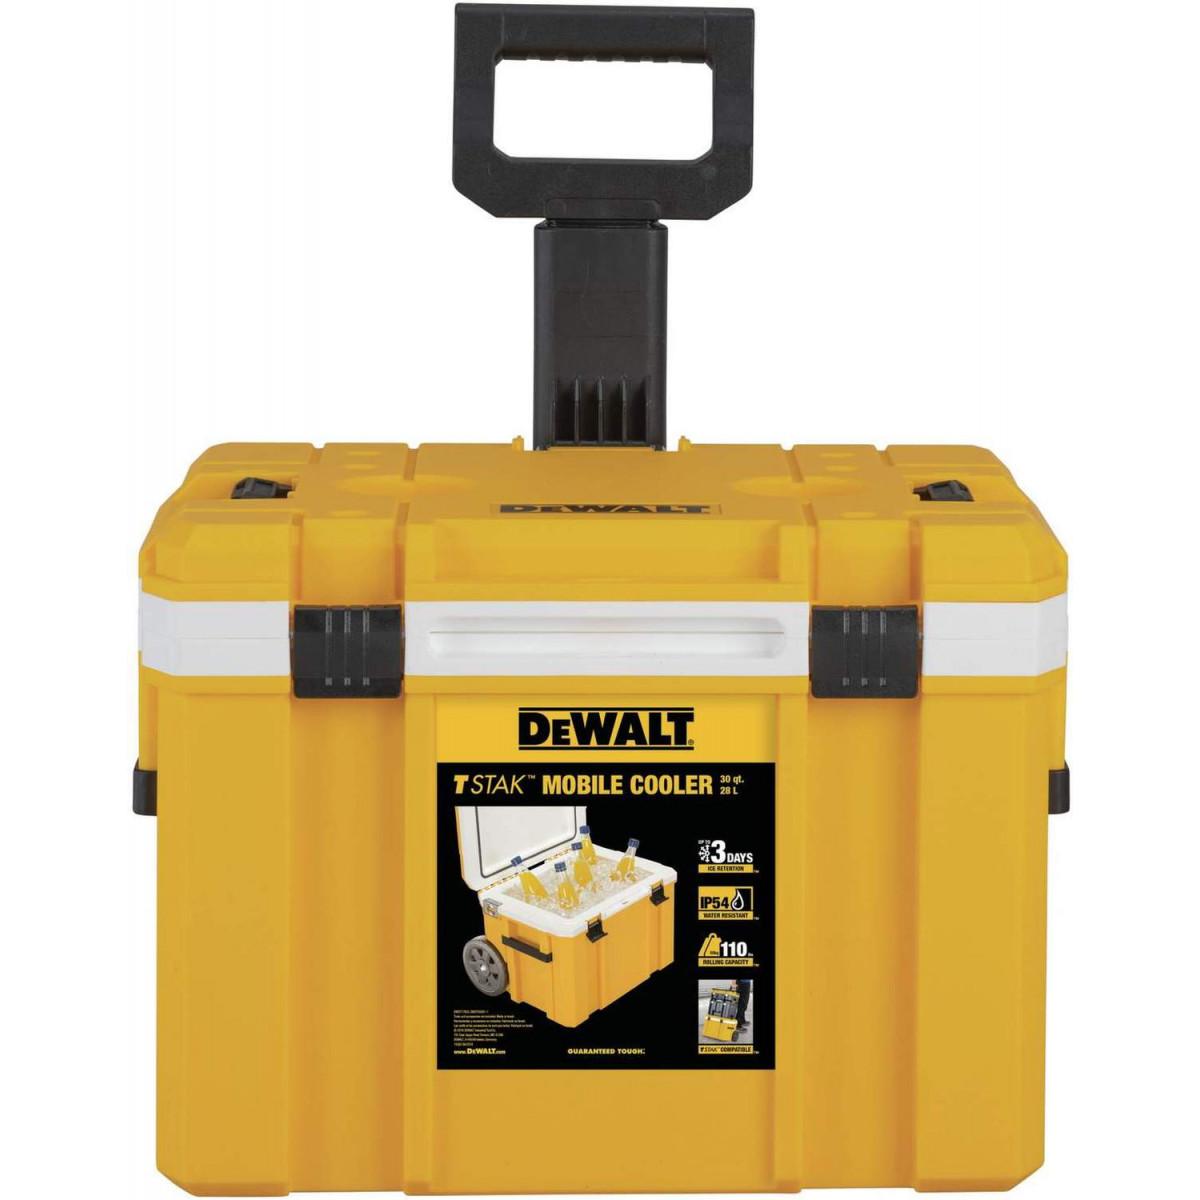 DeWALT DWST17824 TSTAK Mobile Cooler